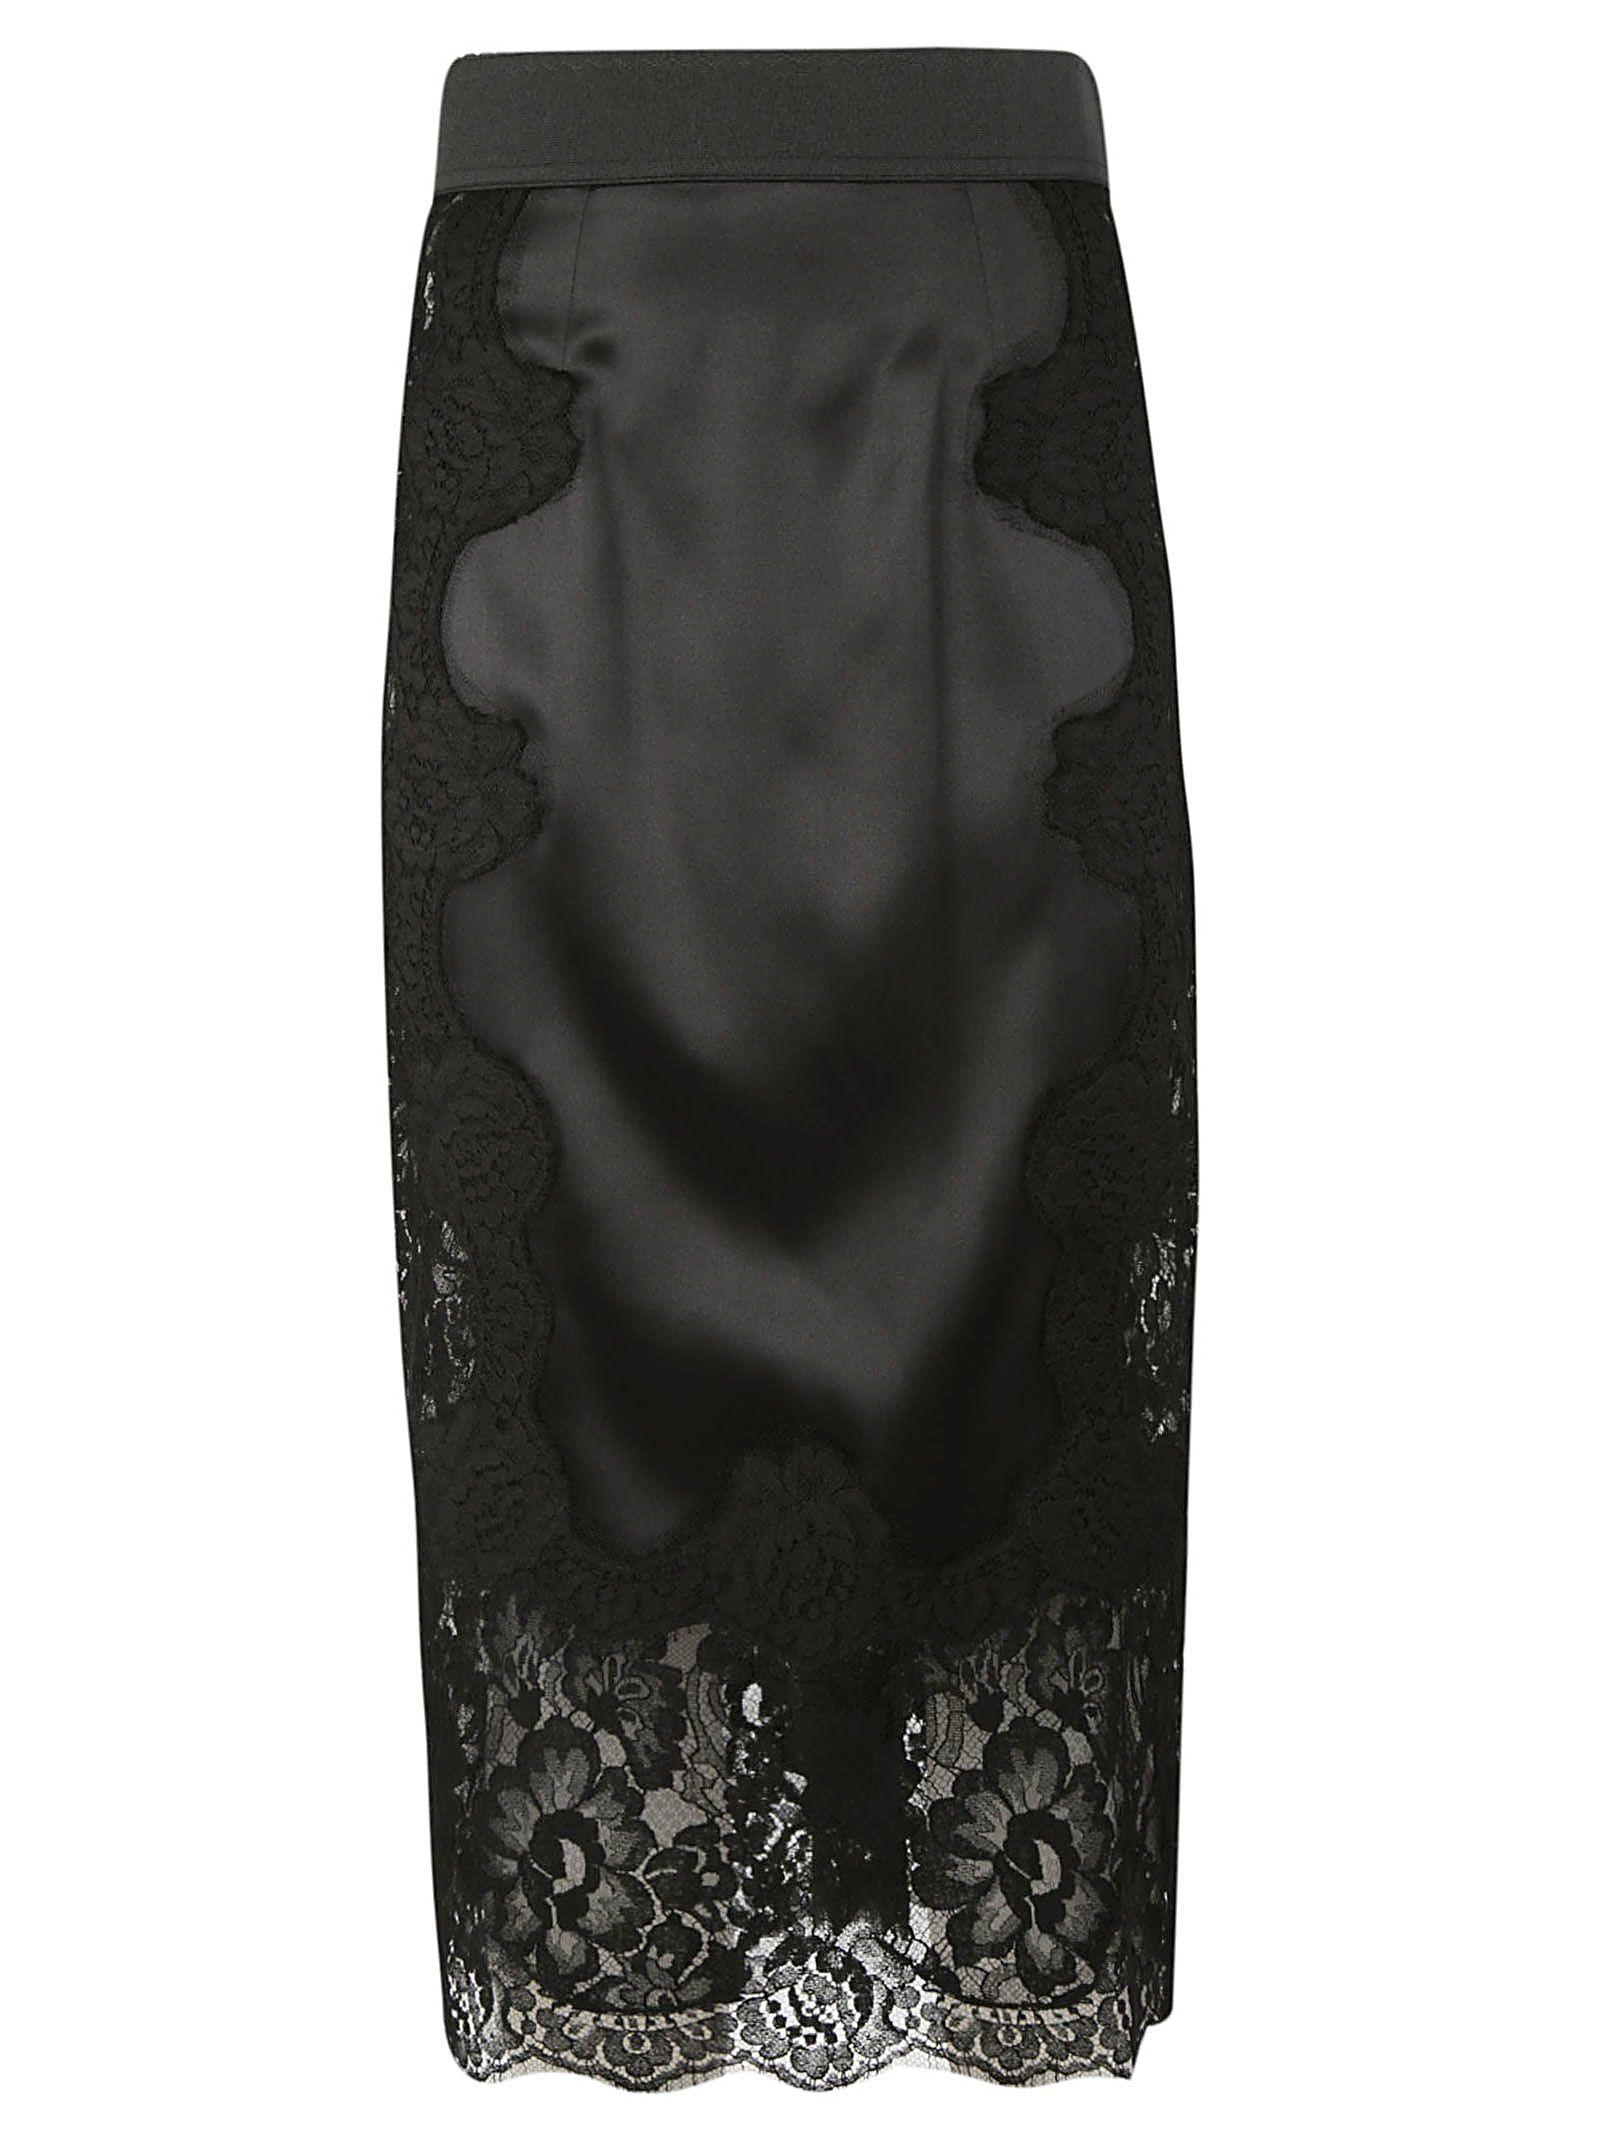 Dolce & Gabbana Lace Paneled Skirt